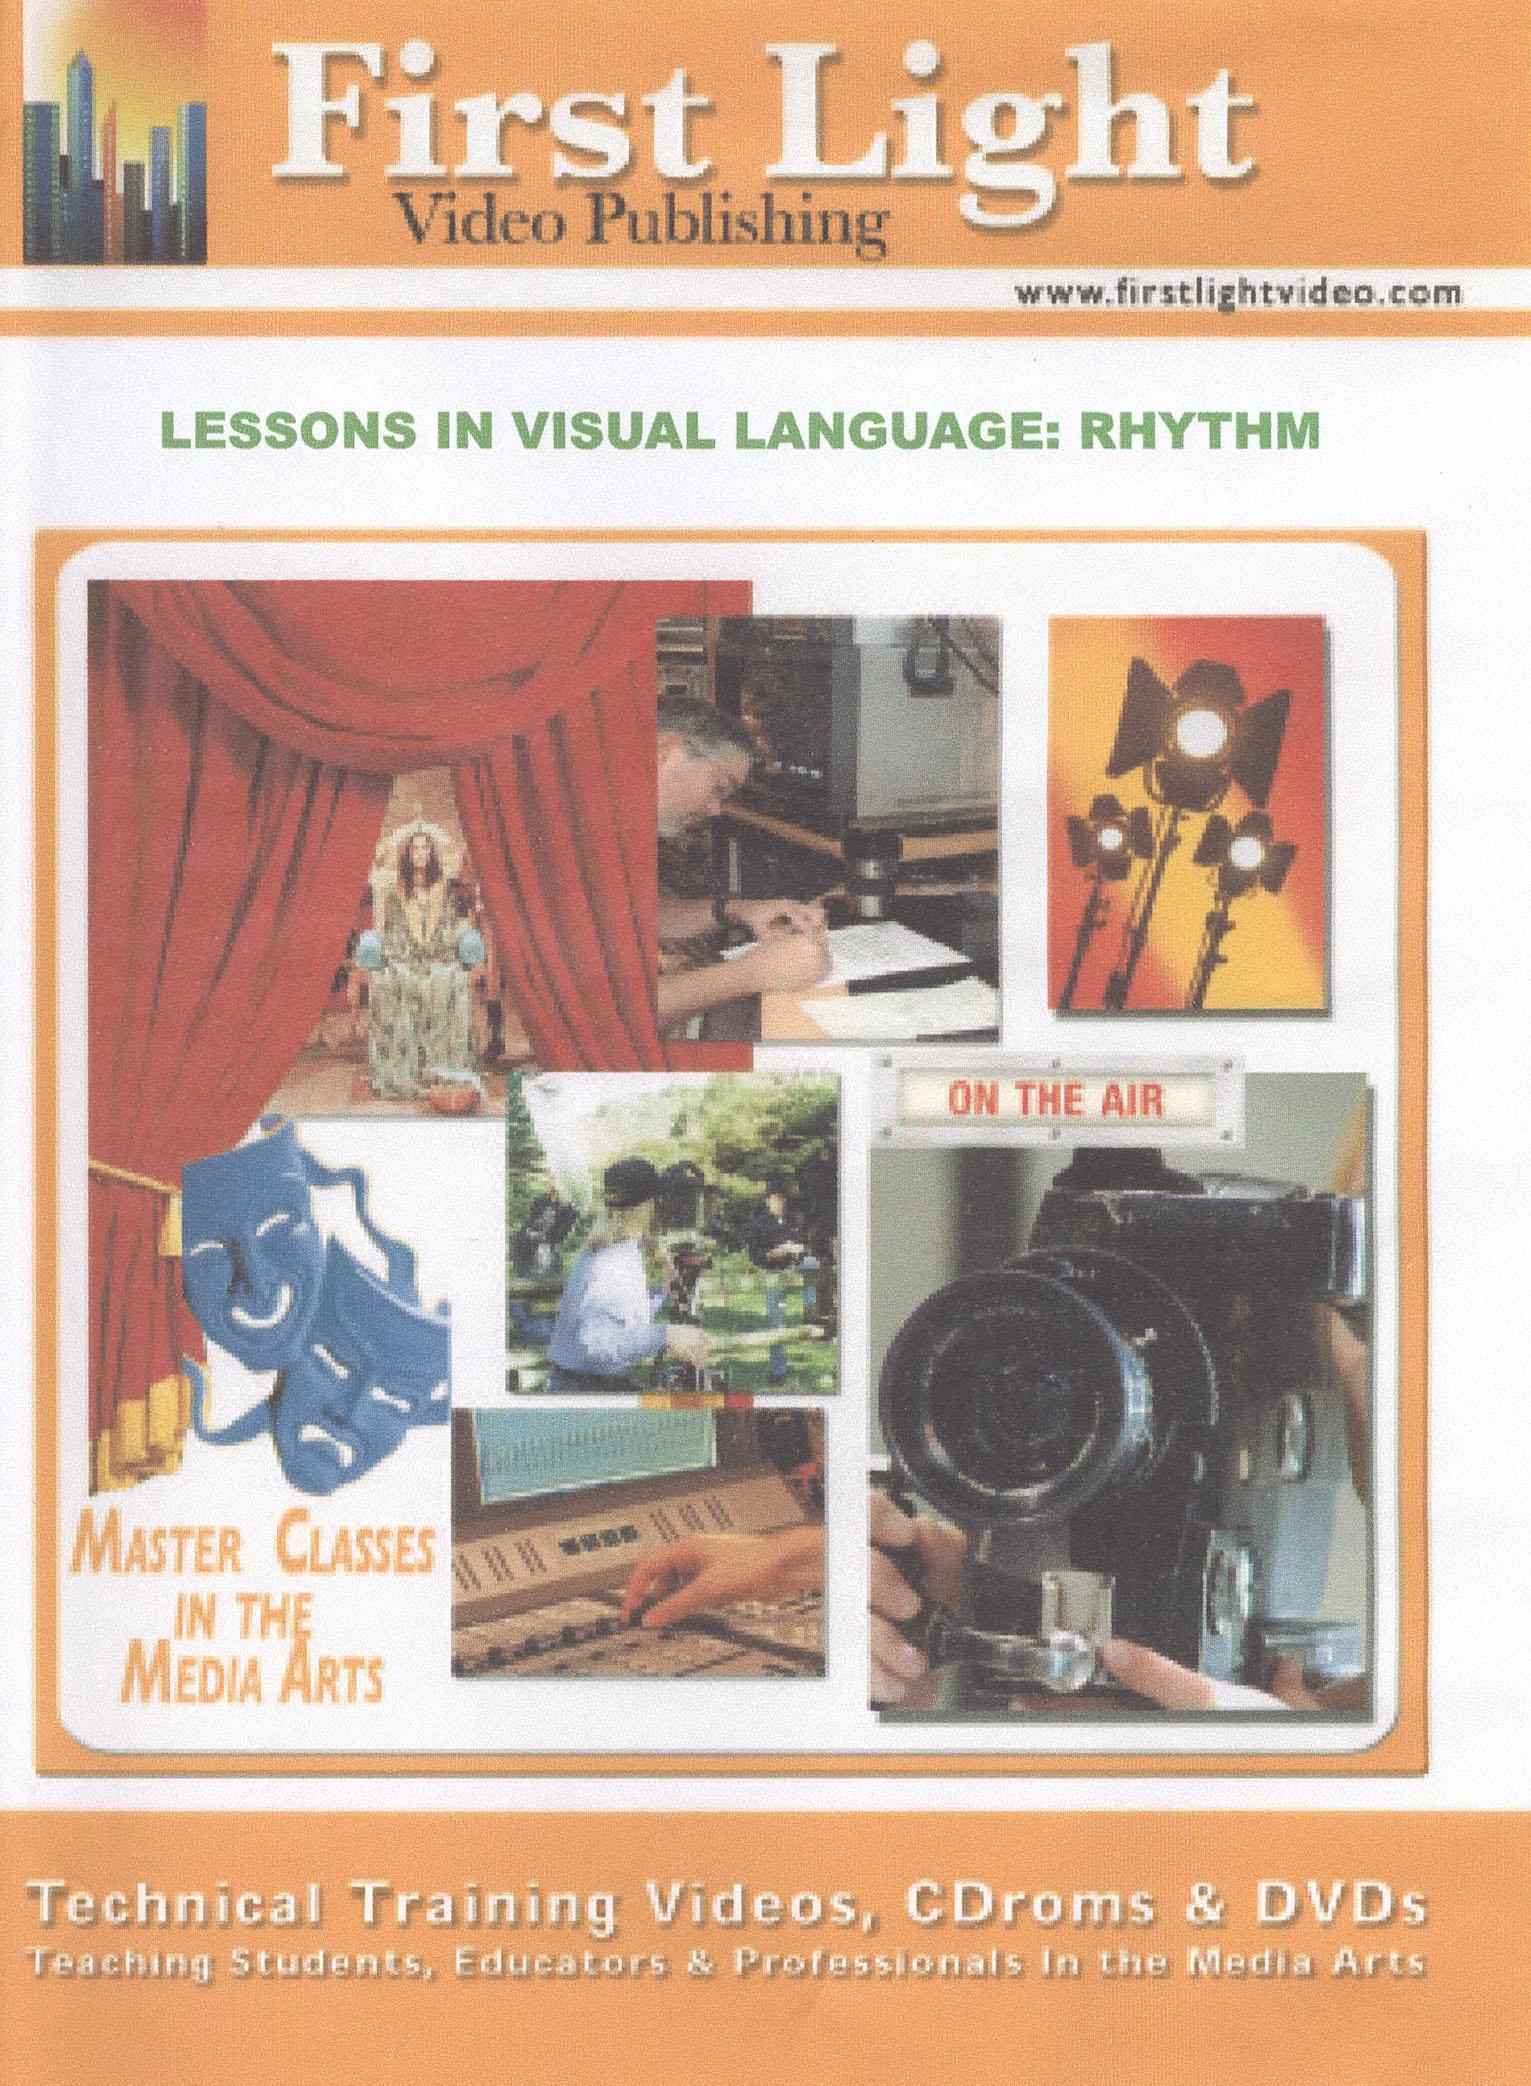 Lessons in Visual Language: Rhythm